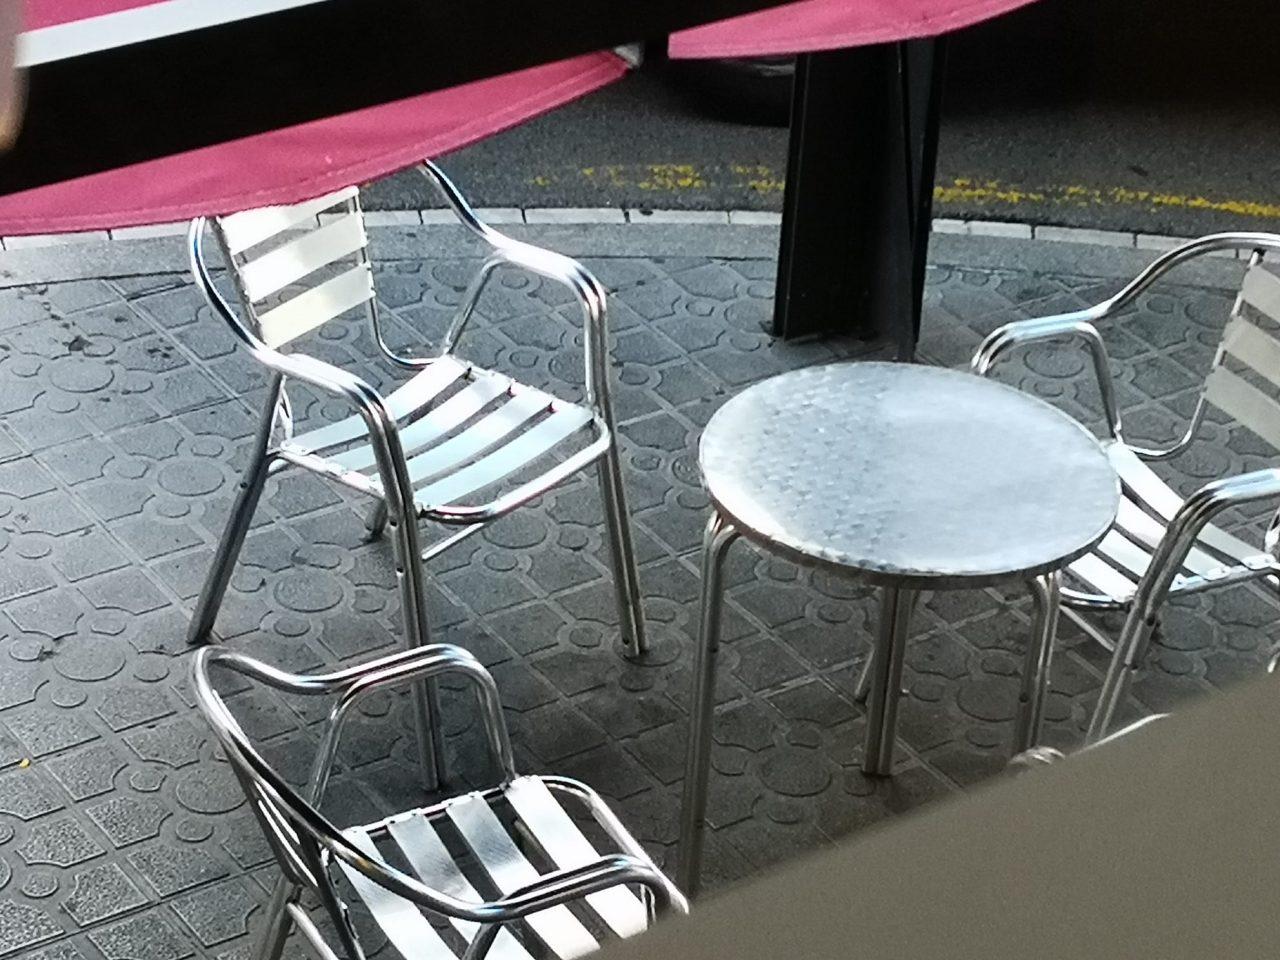 terrasses-1280x960.jpg